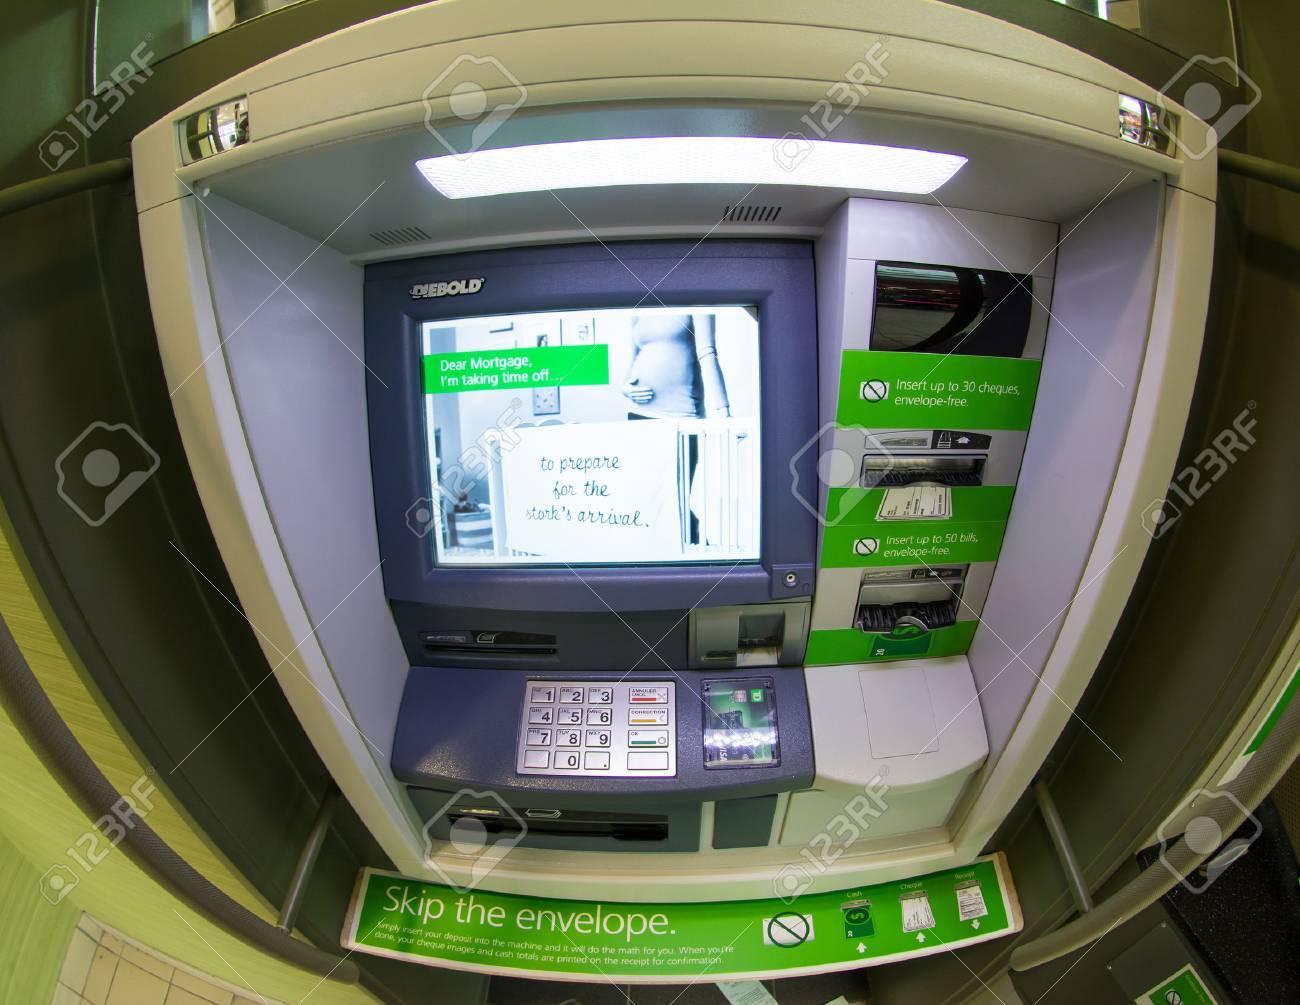 TORONTO,CANADA-APRIL 4,2015: TD bank ATM, discard the envelope